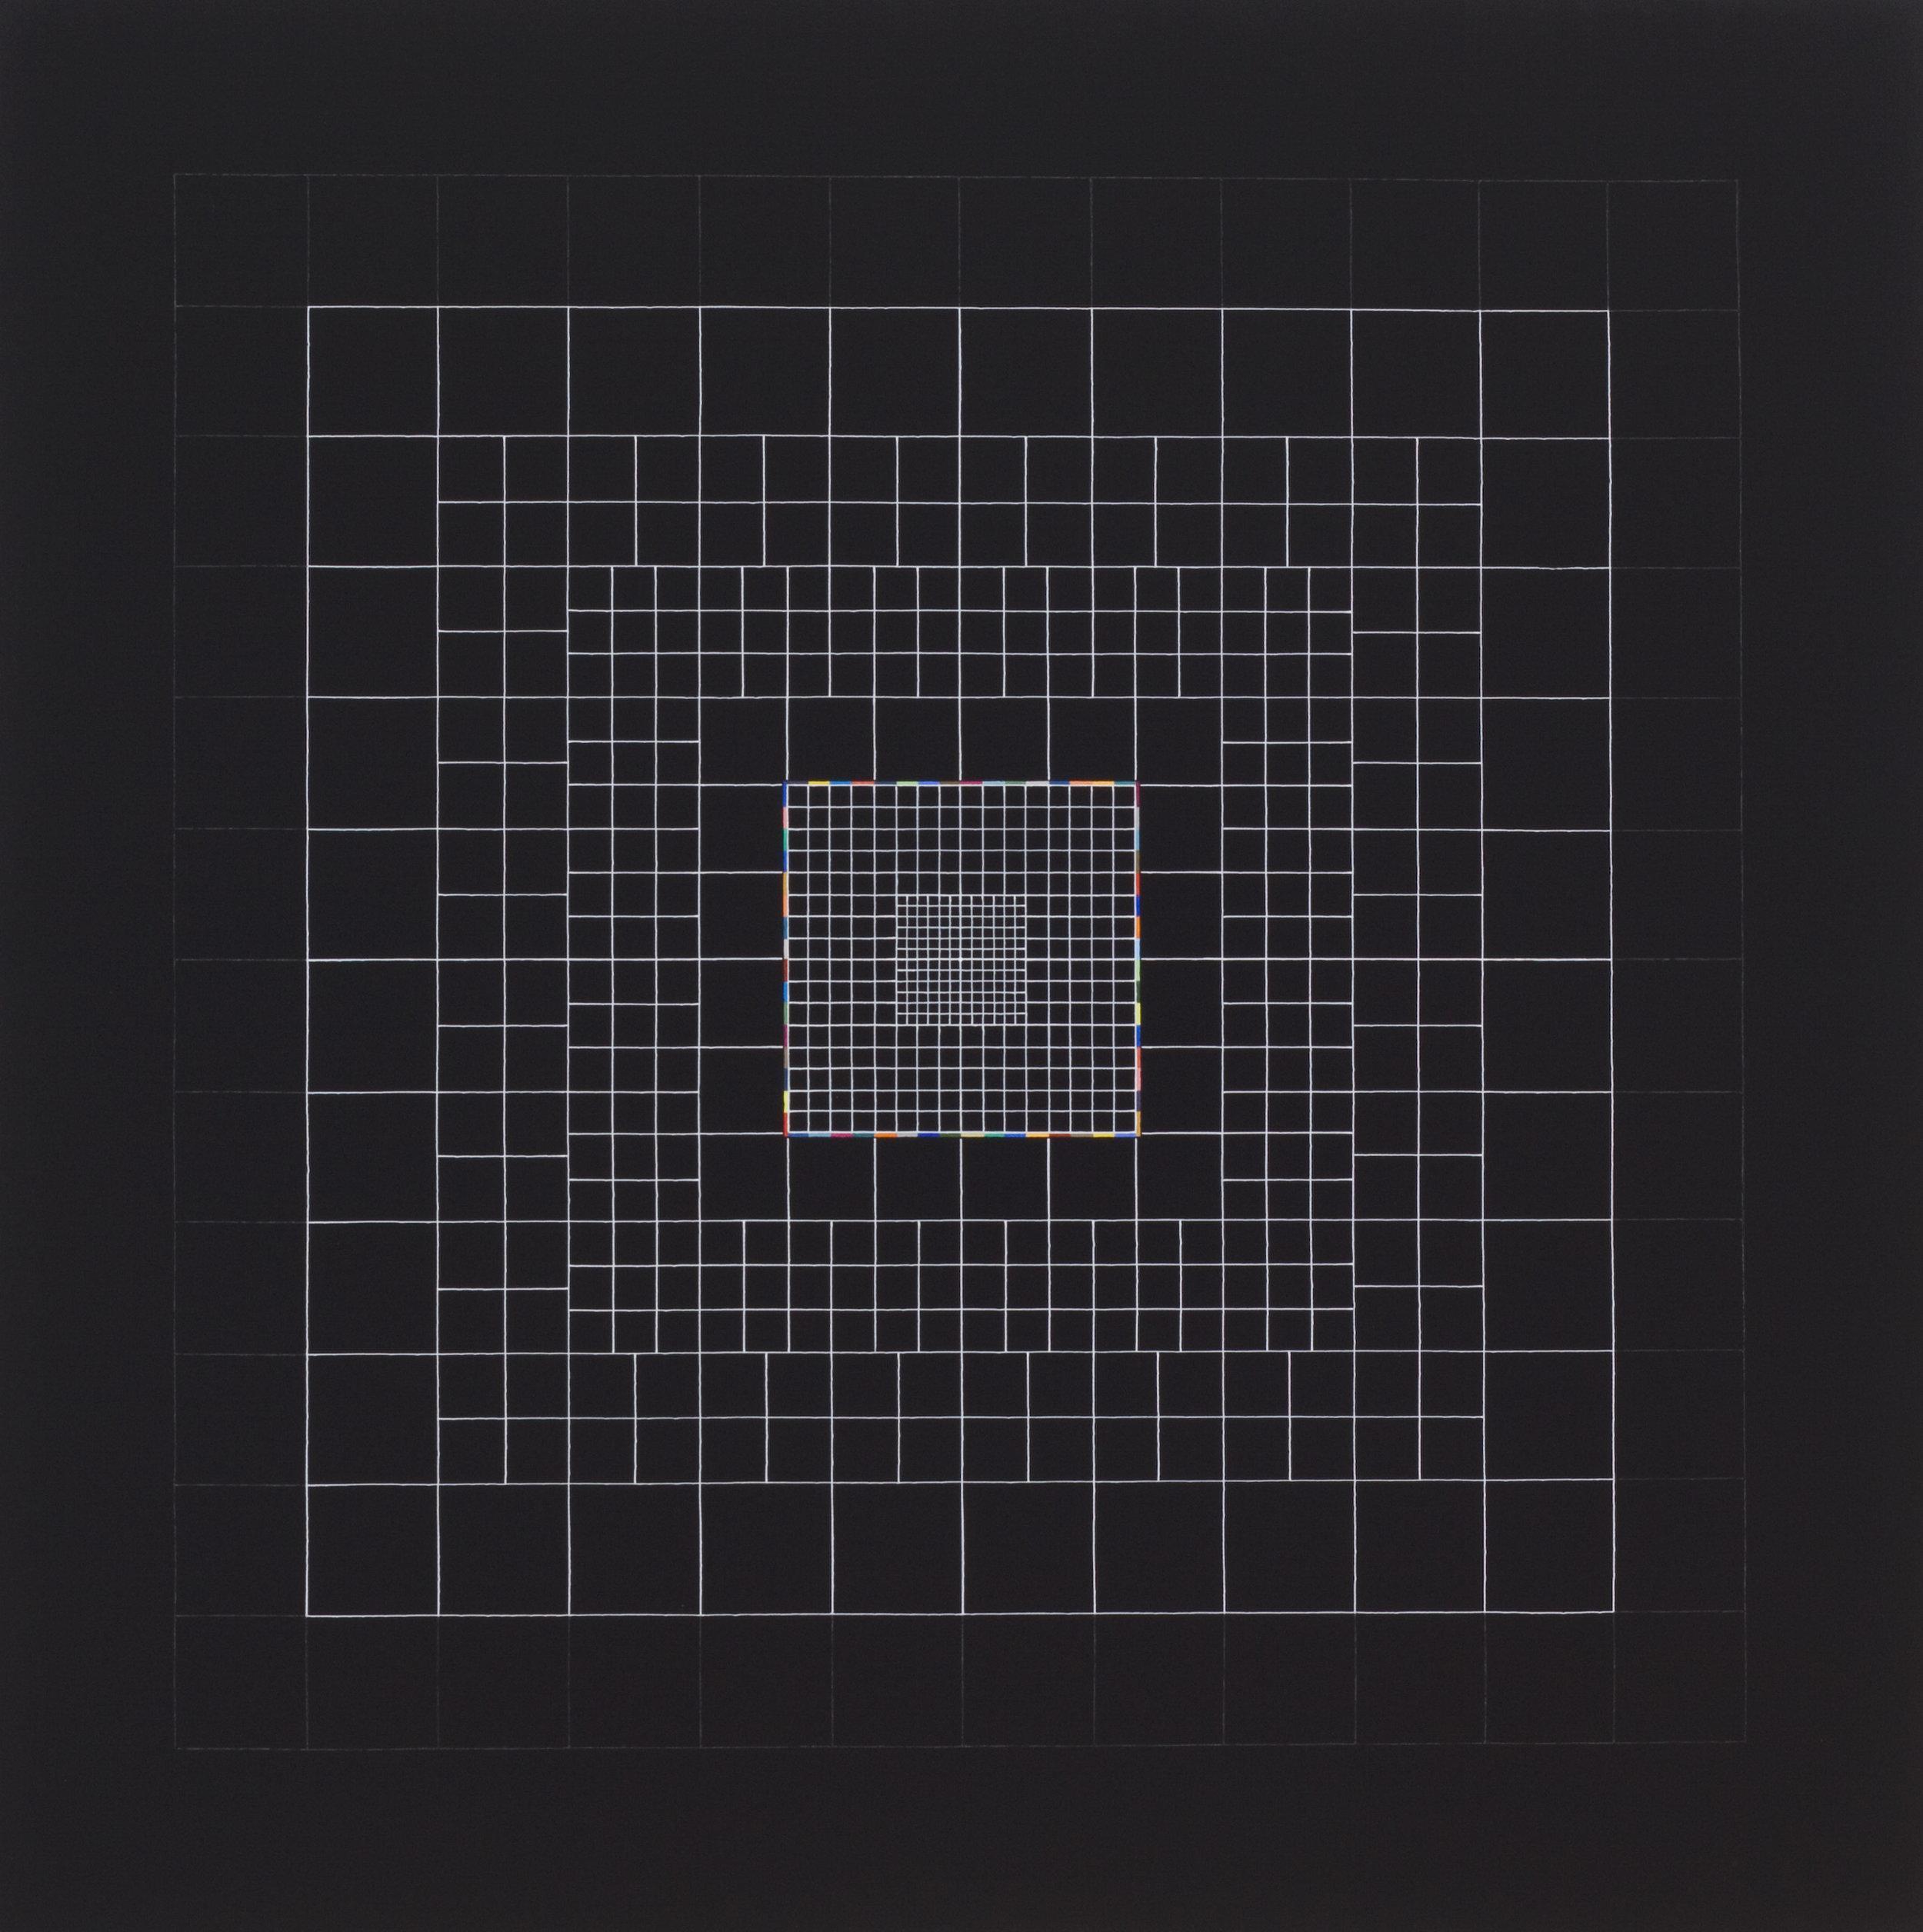 Yantra-ipsum-creator(1)2013.Sep, acrylic on canvas, 29 1/2 x 29 1/2 in. [75x75cm]